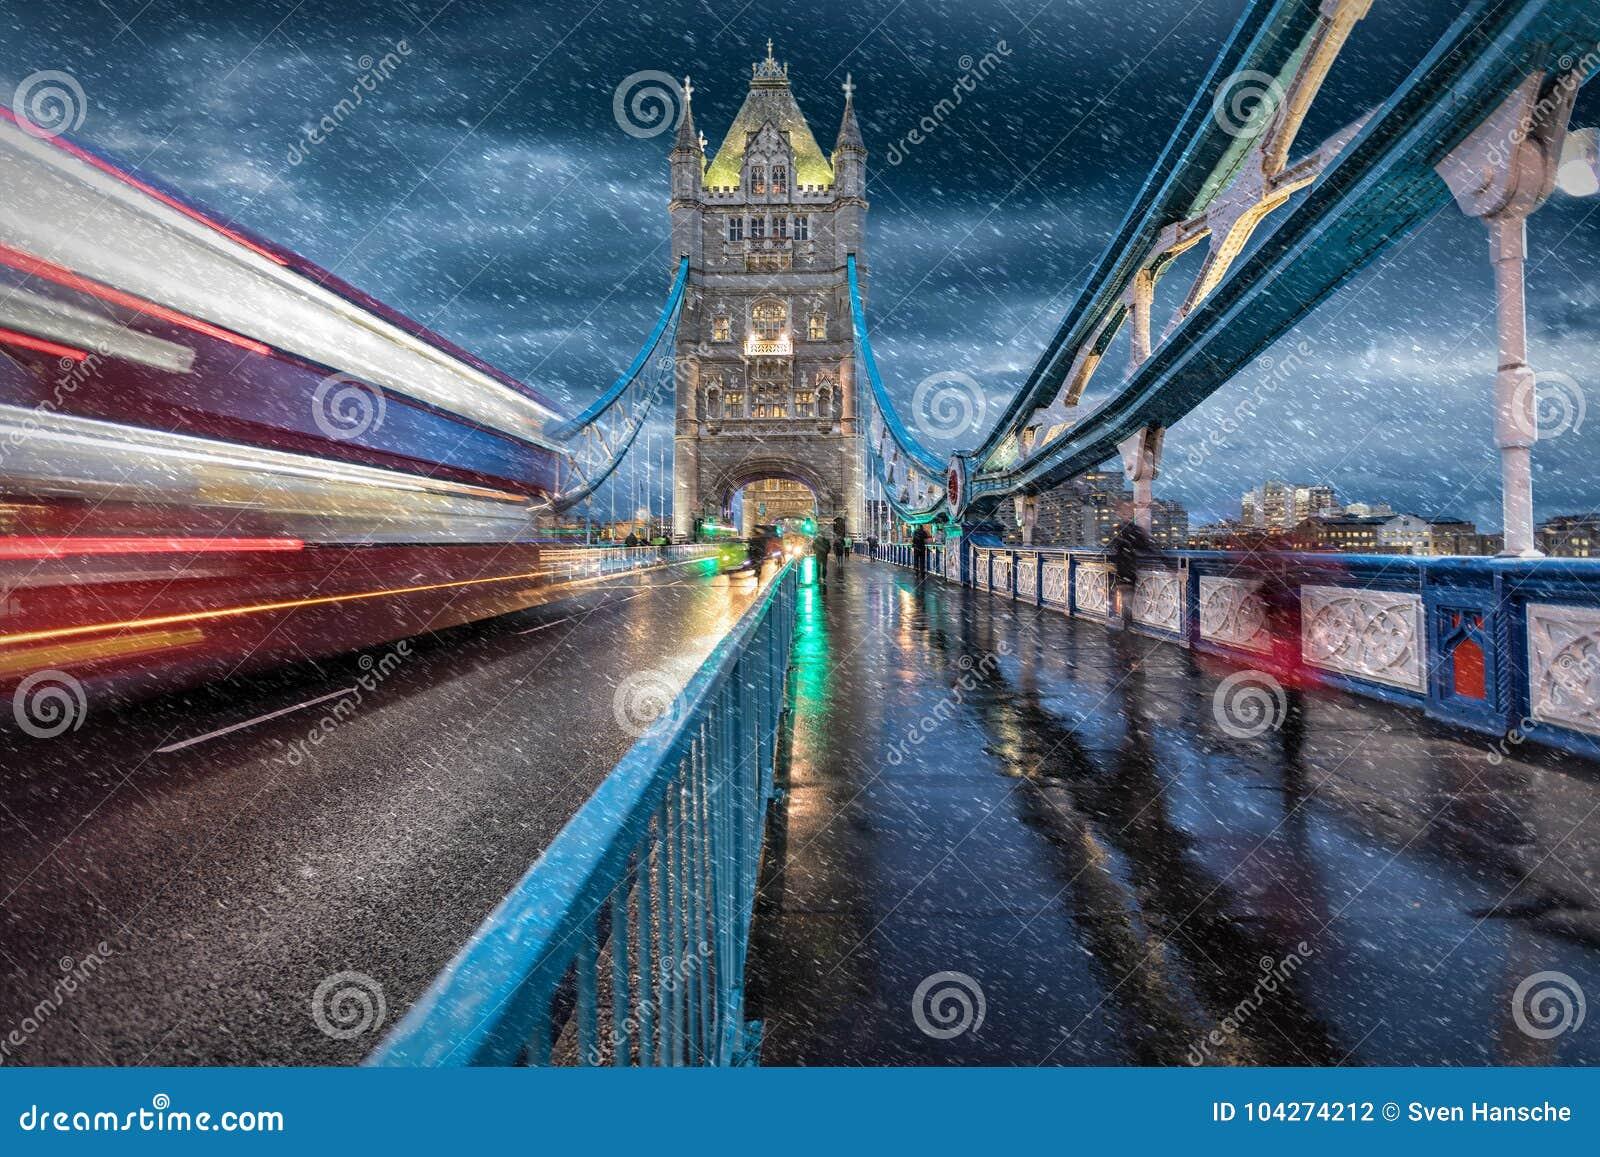 The Tower Bridge in London in winter